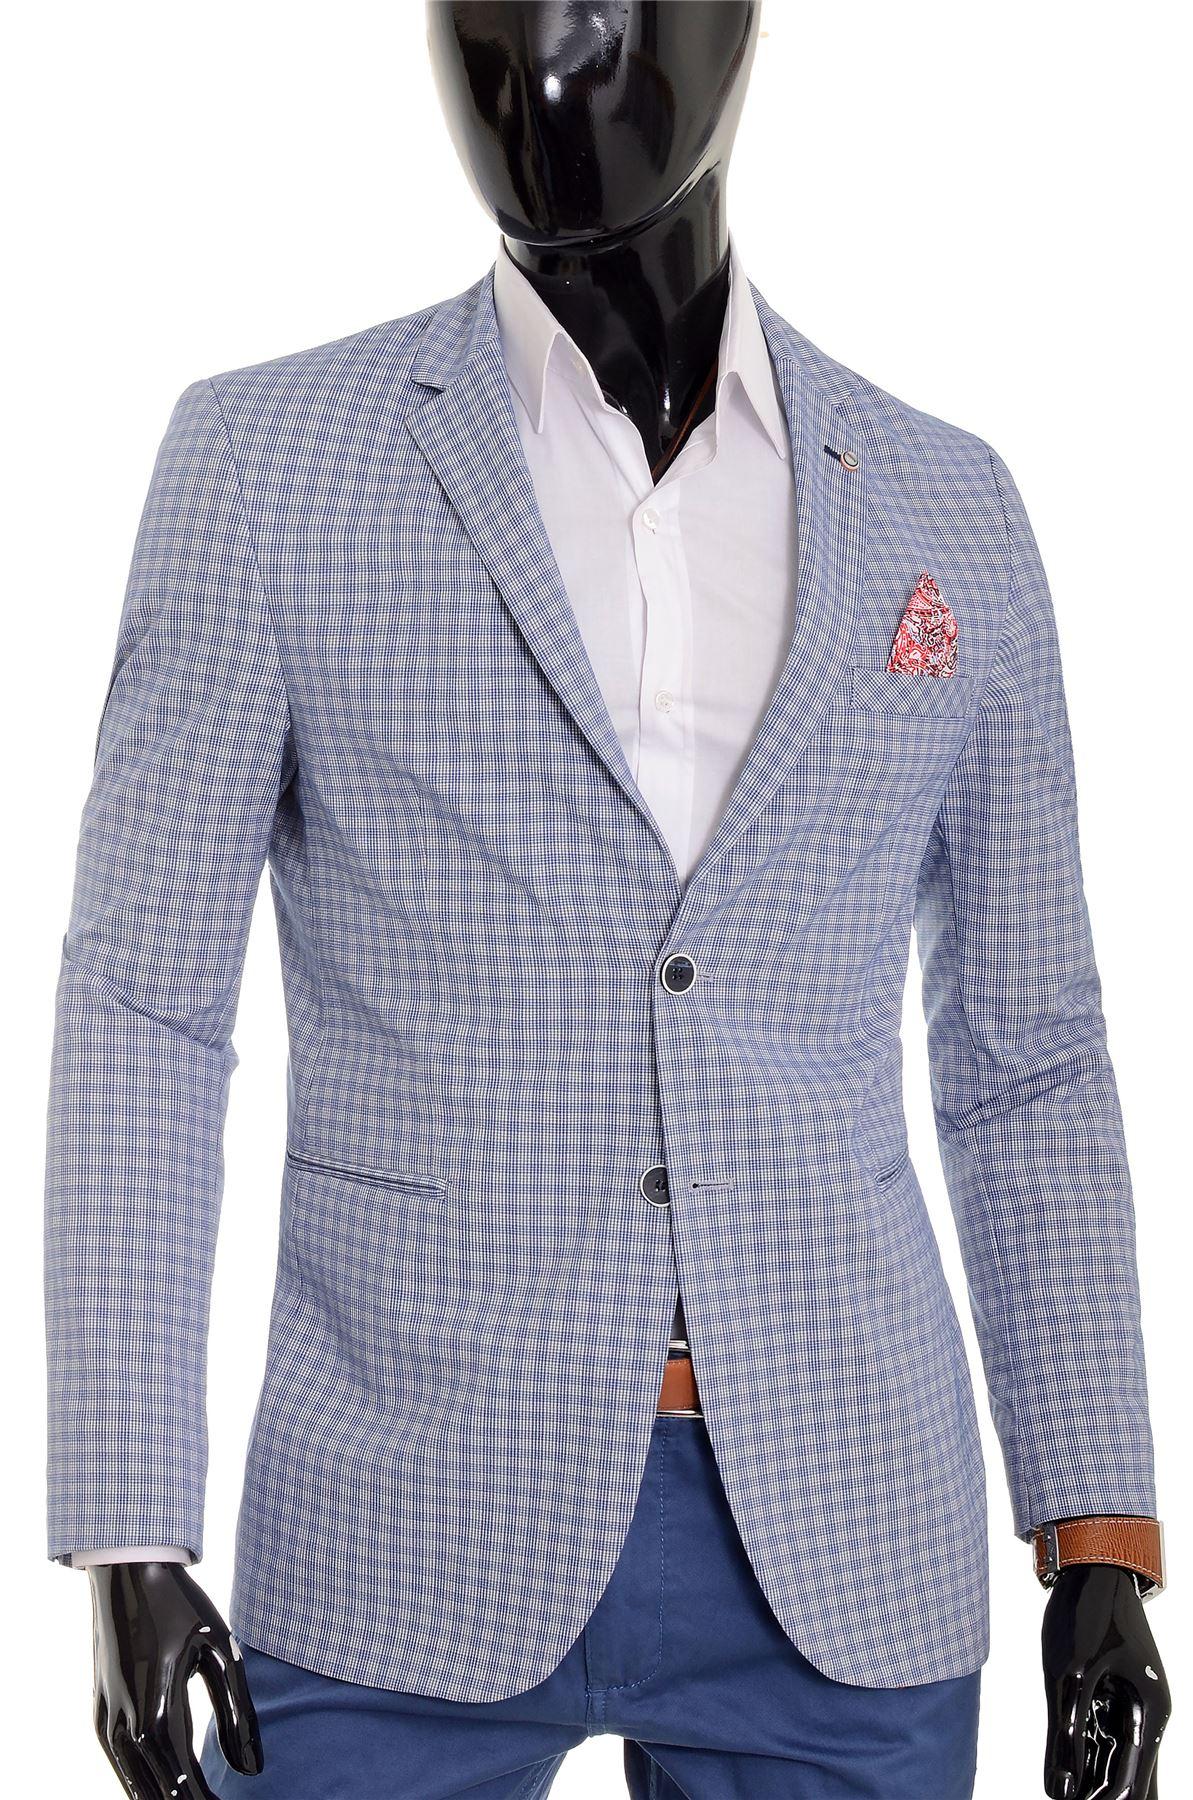 Mens Checkered Blazer Jacket Formal Blue Brown Paisley Finish Cotton Regular Fit